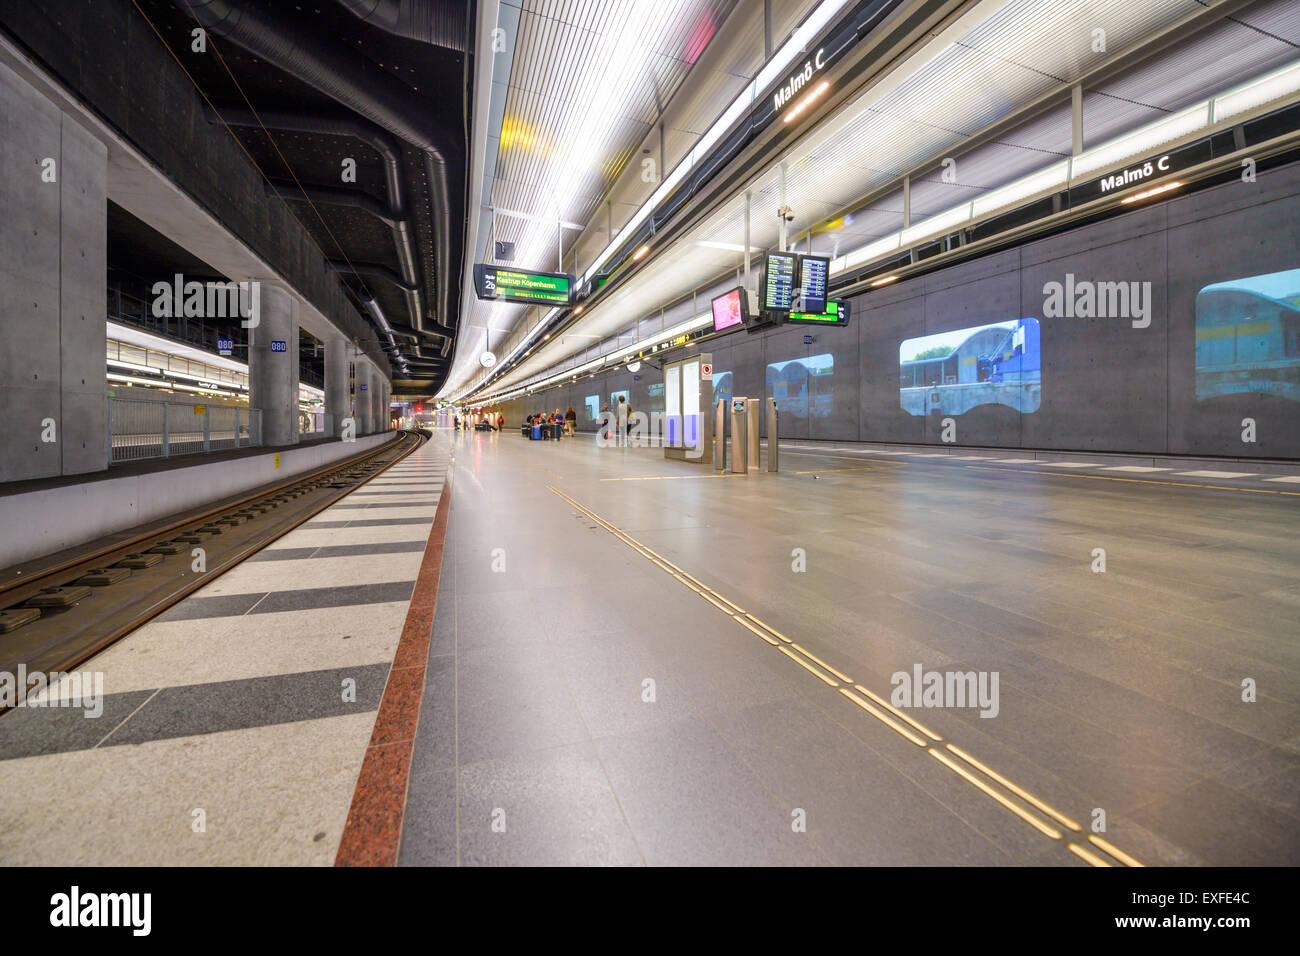 MALMO, SWEDEN - SEPTEMBER 14, 2013: Malmo Central Station on an Oresund Line platform. - Stock Image